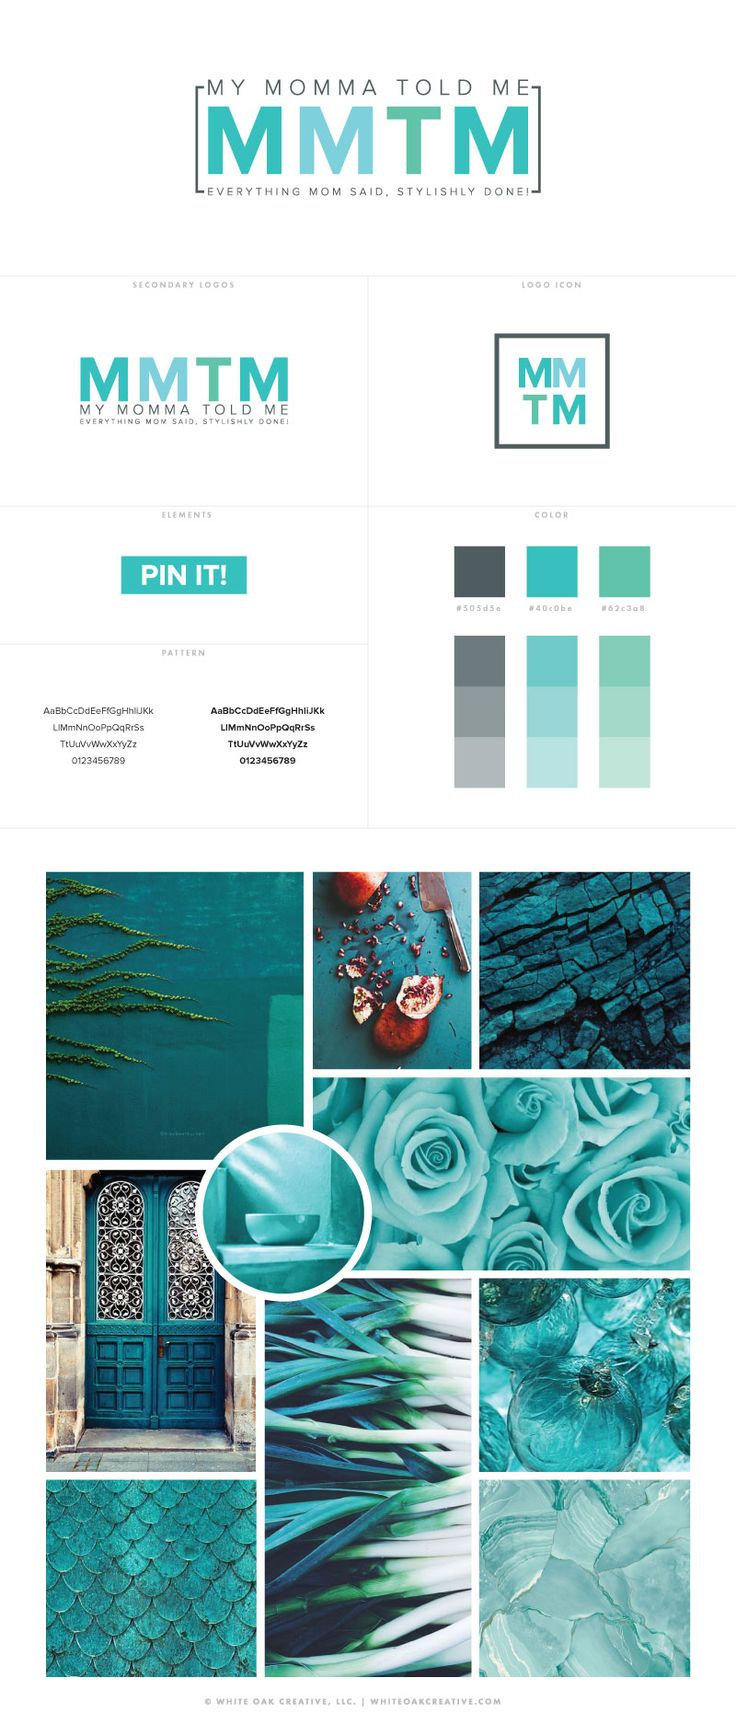 My Moma Told Me WordPress Blog Design by White Oak Creative